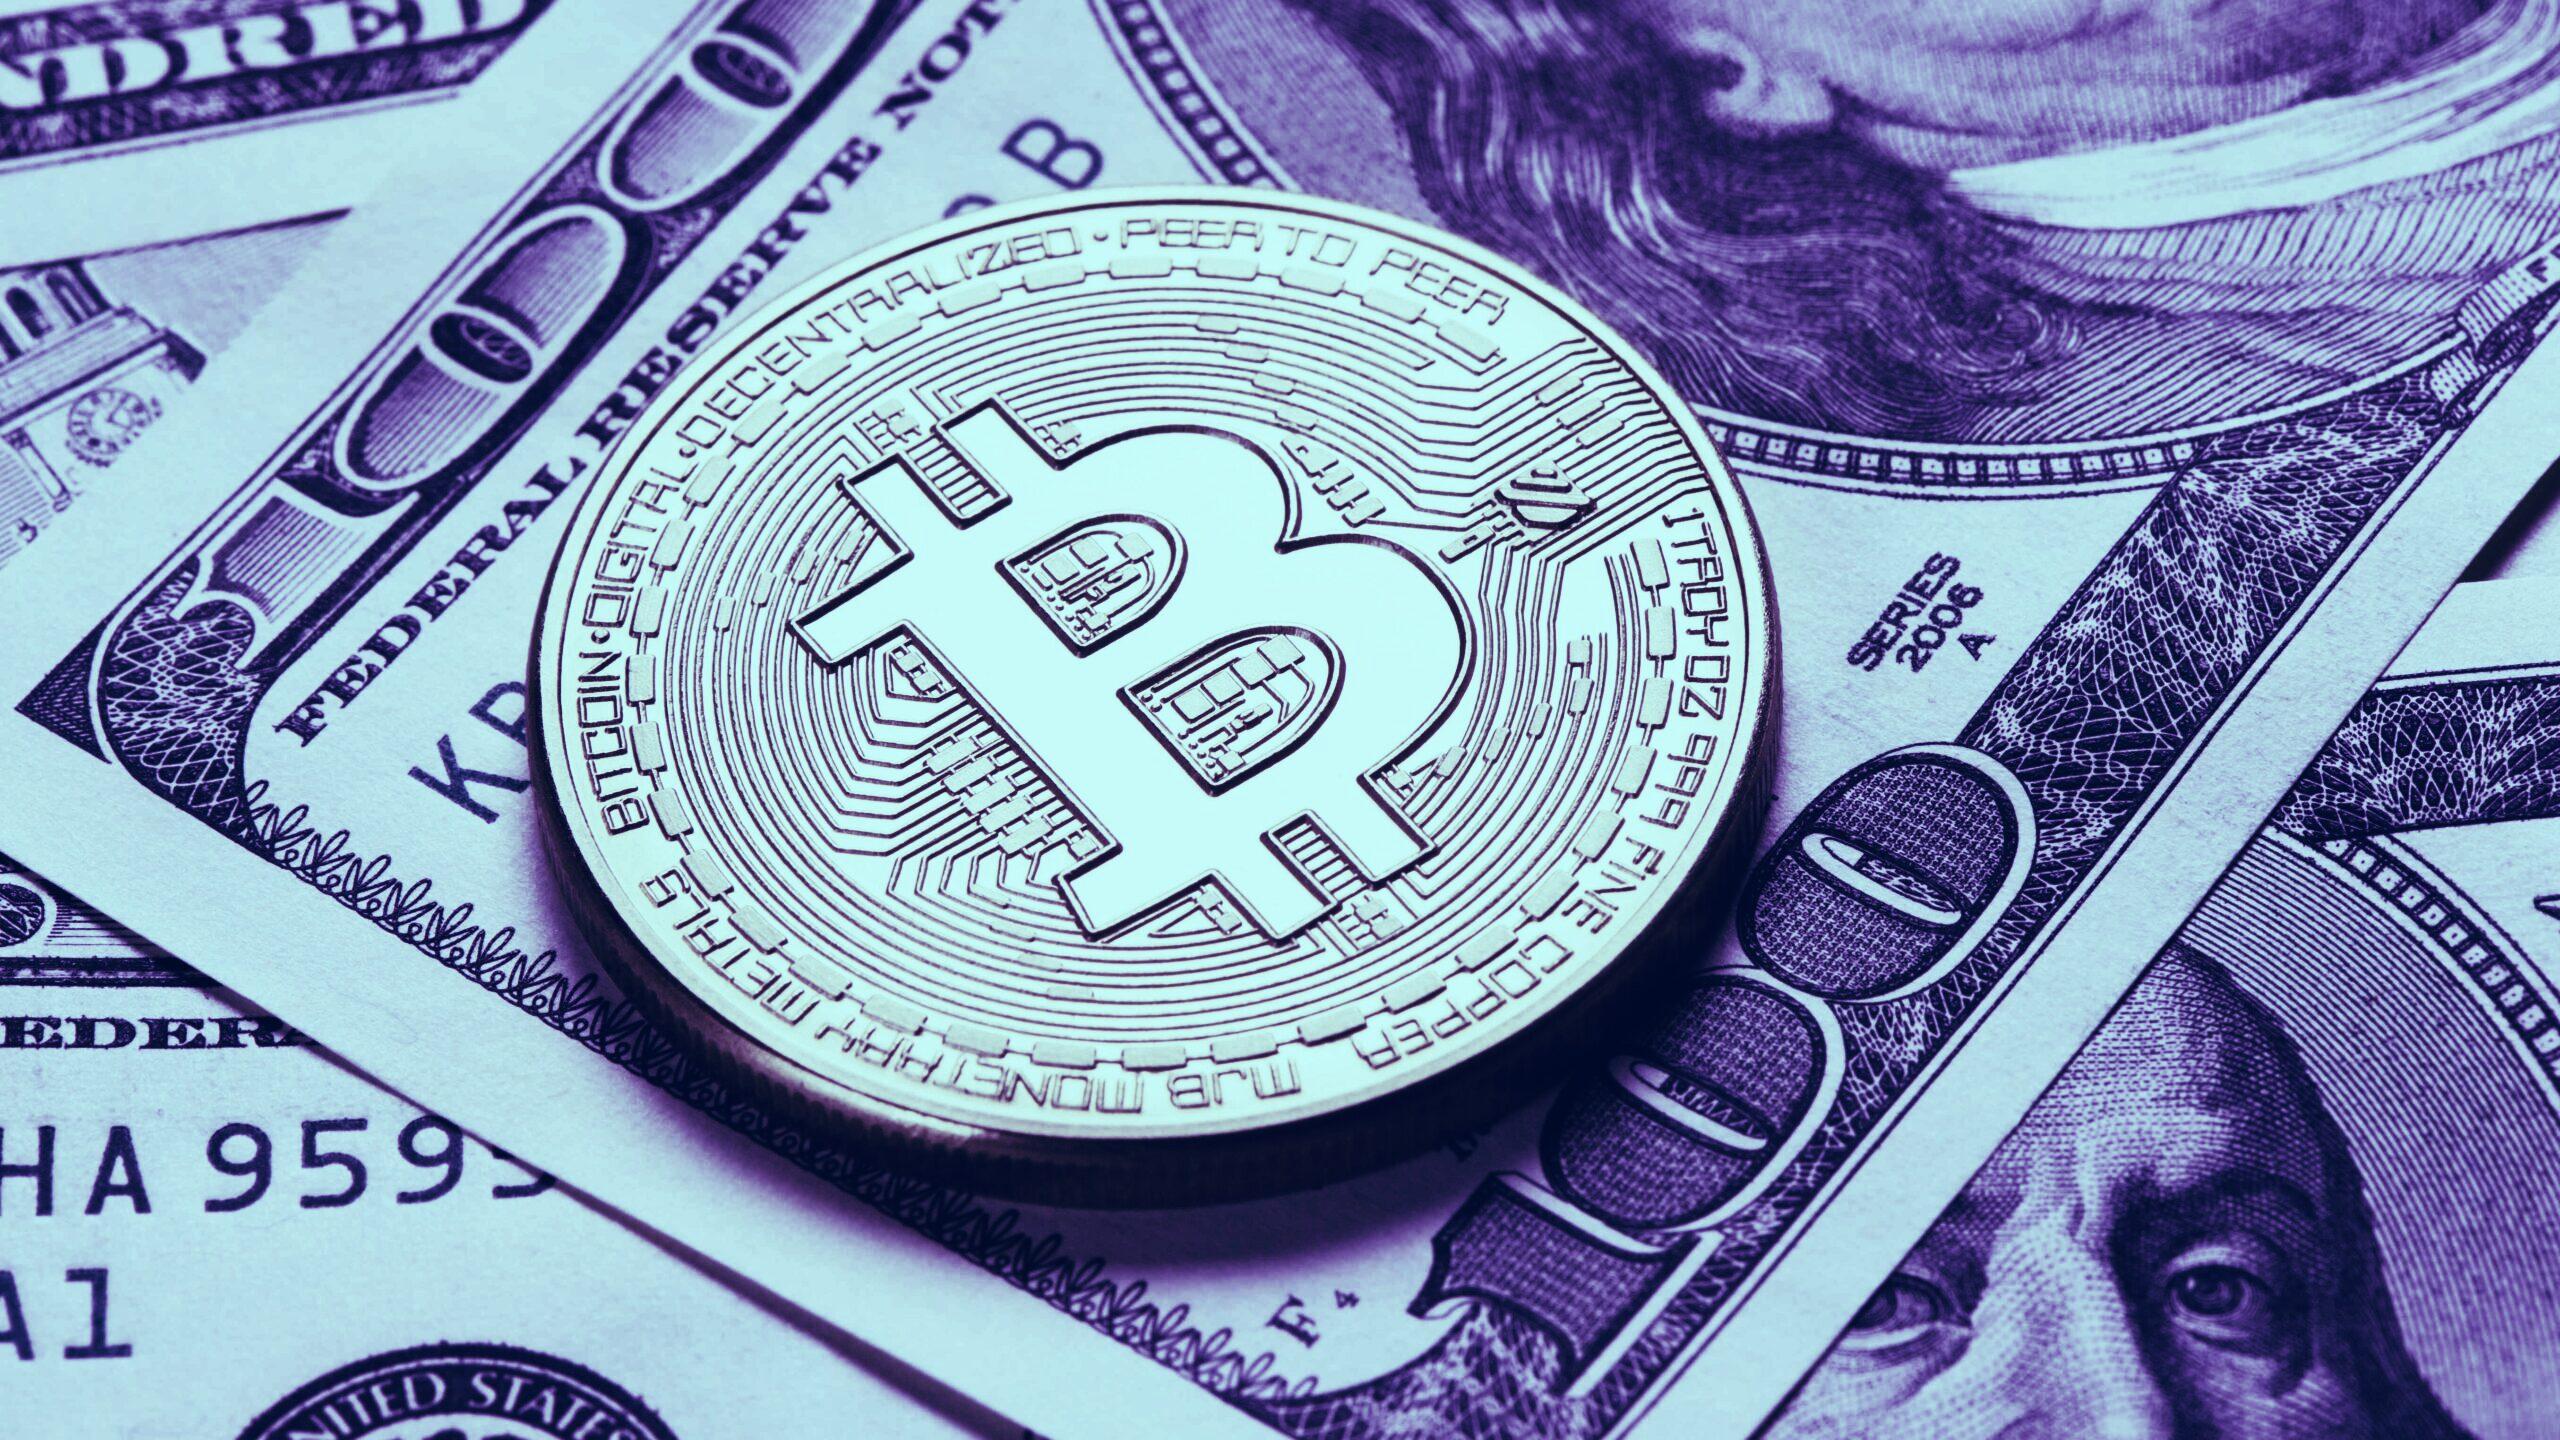 raghuram rajan bitcoin